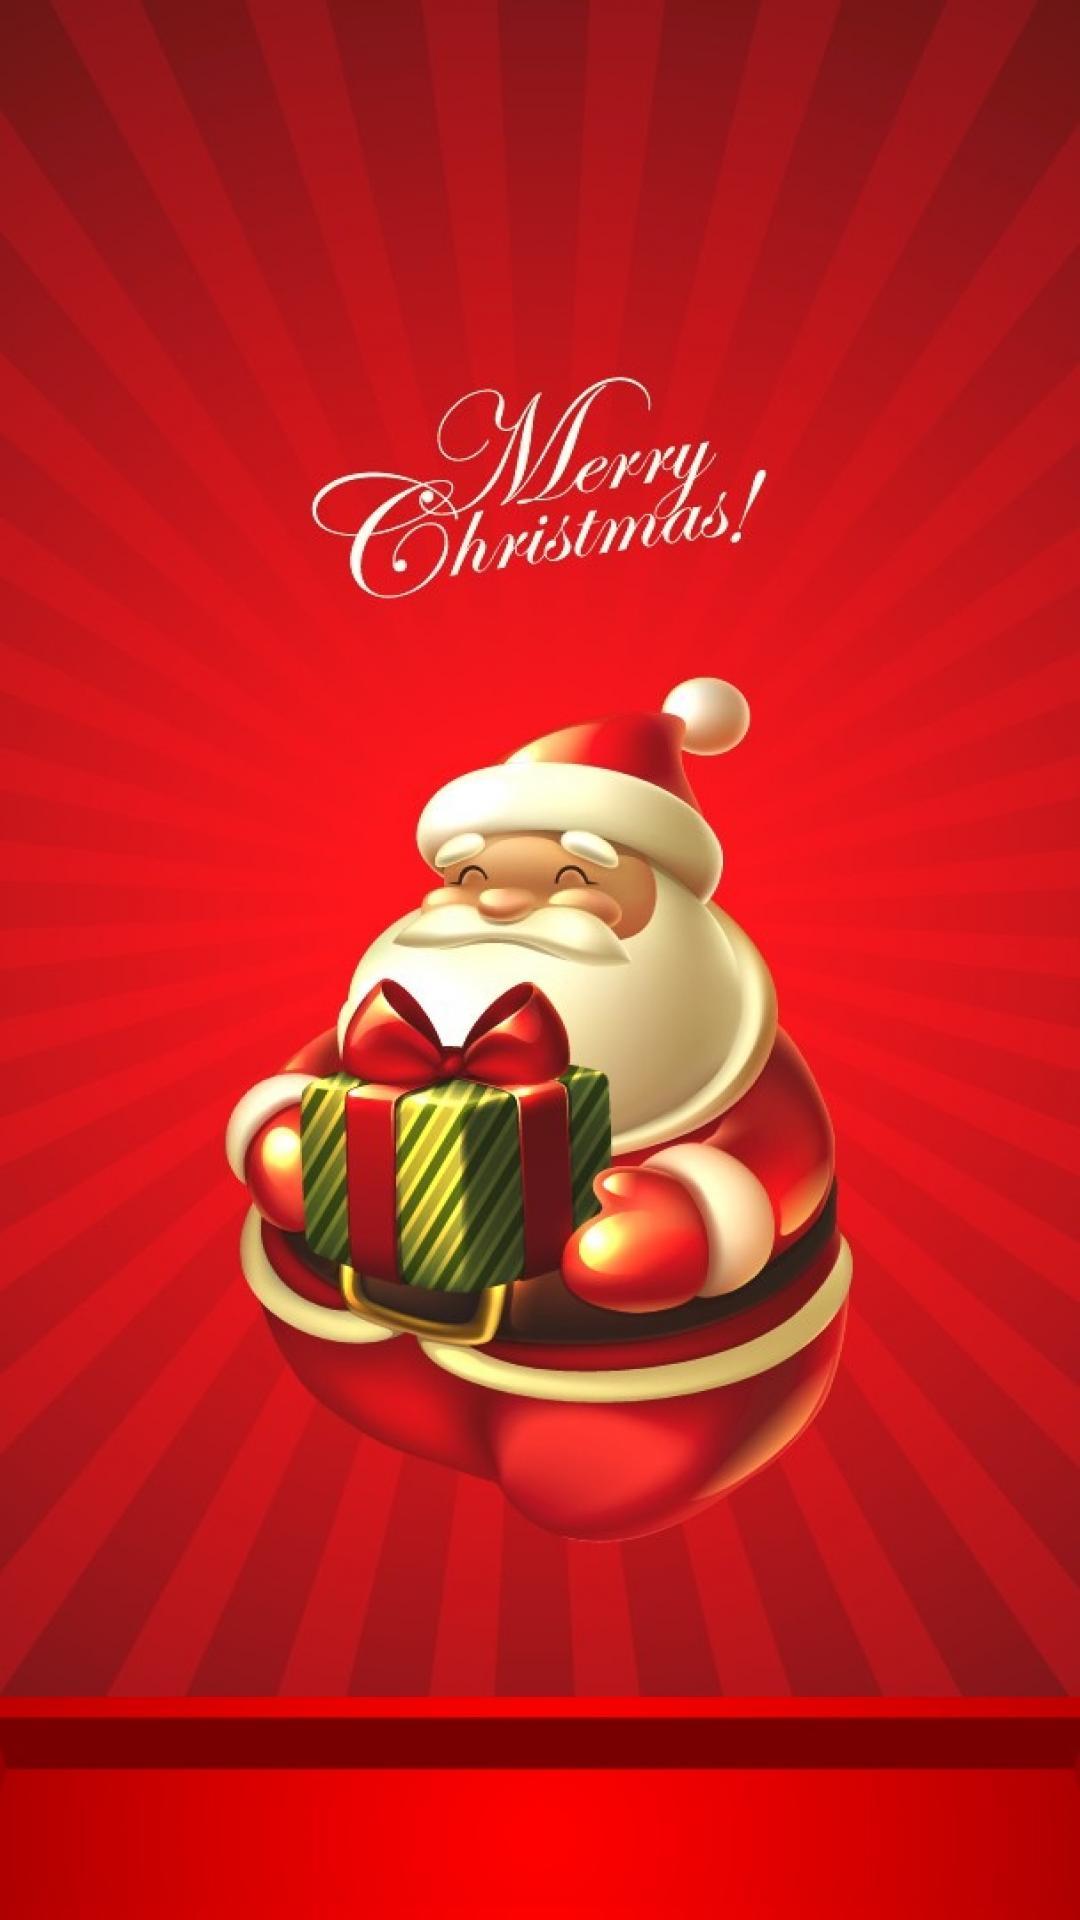 Cute Christmas Iphone 6s Wallpaper 2016 Christmas Iphone 1080x1920